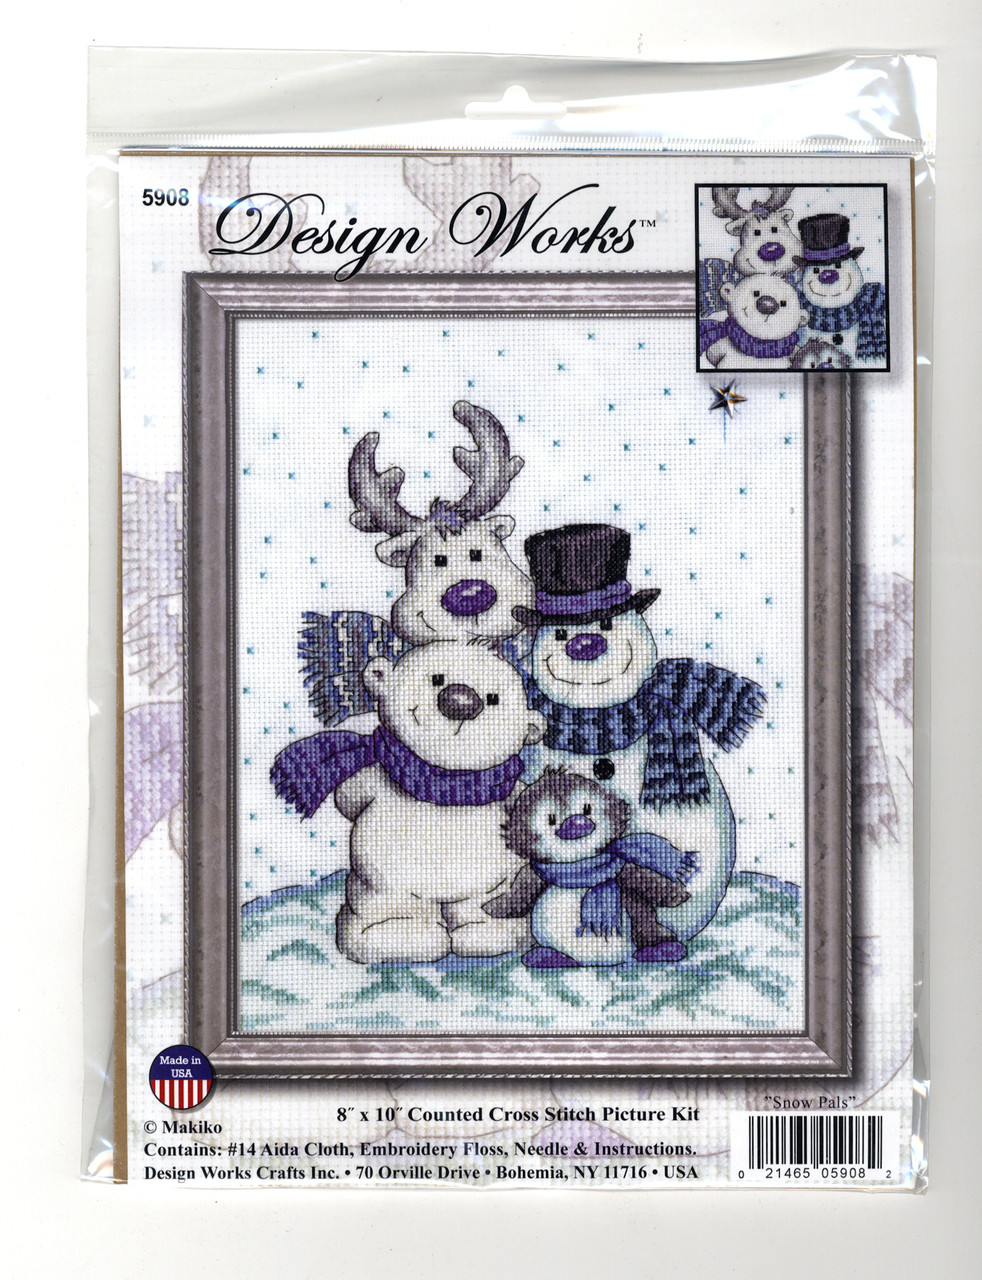 Design Works - Snow Pals